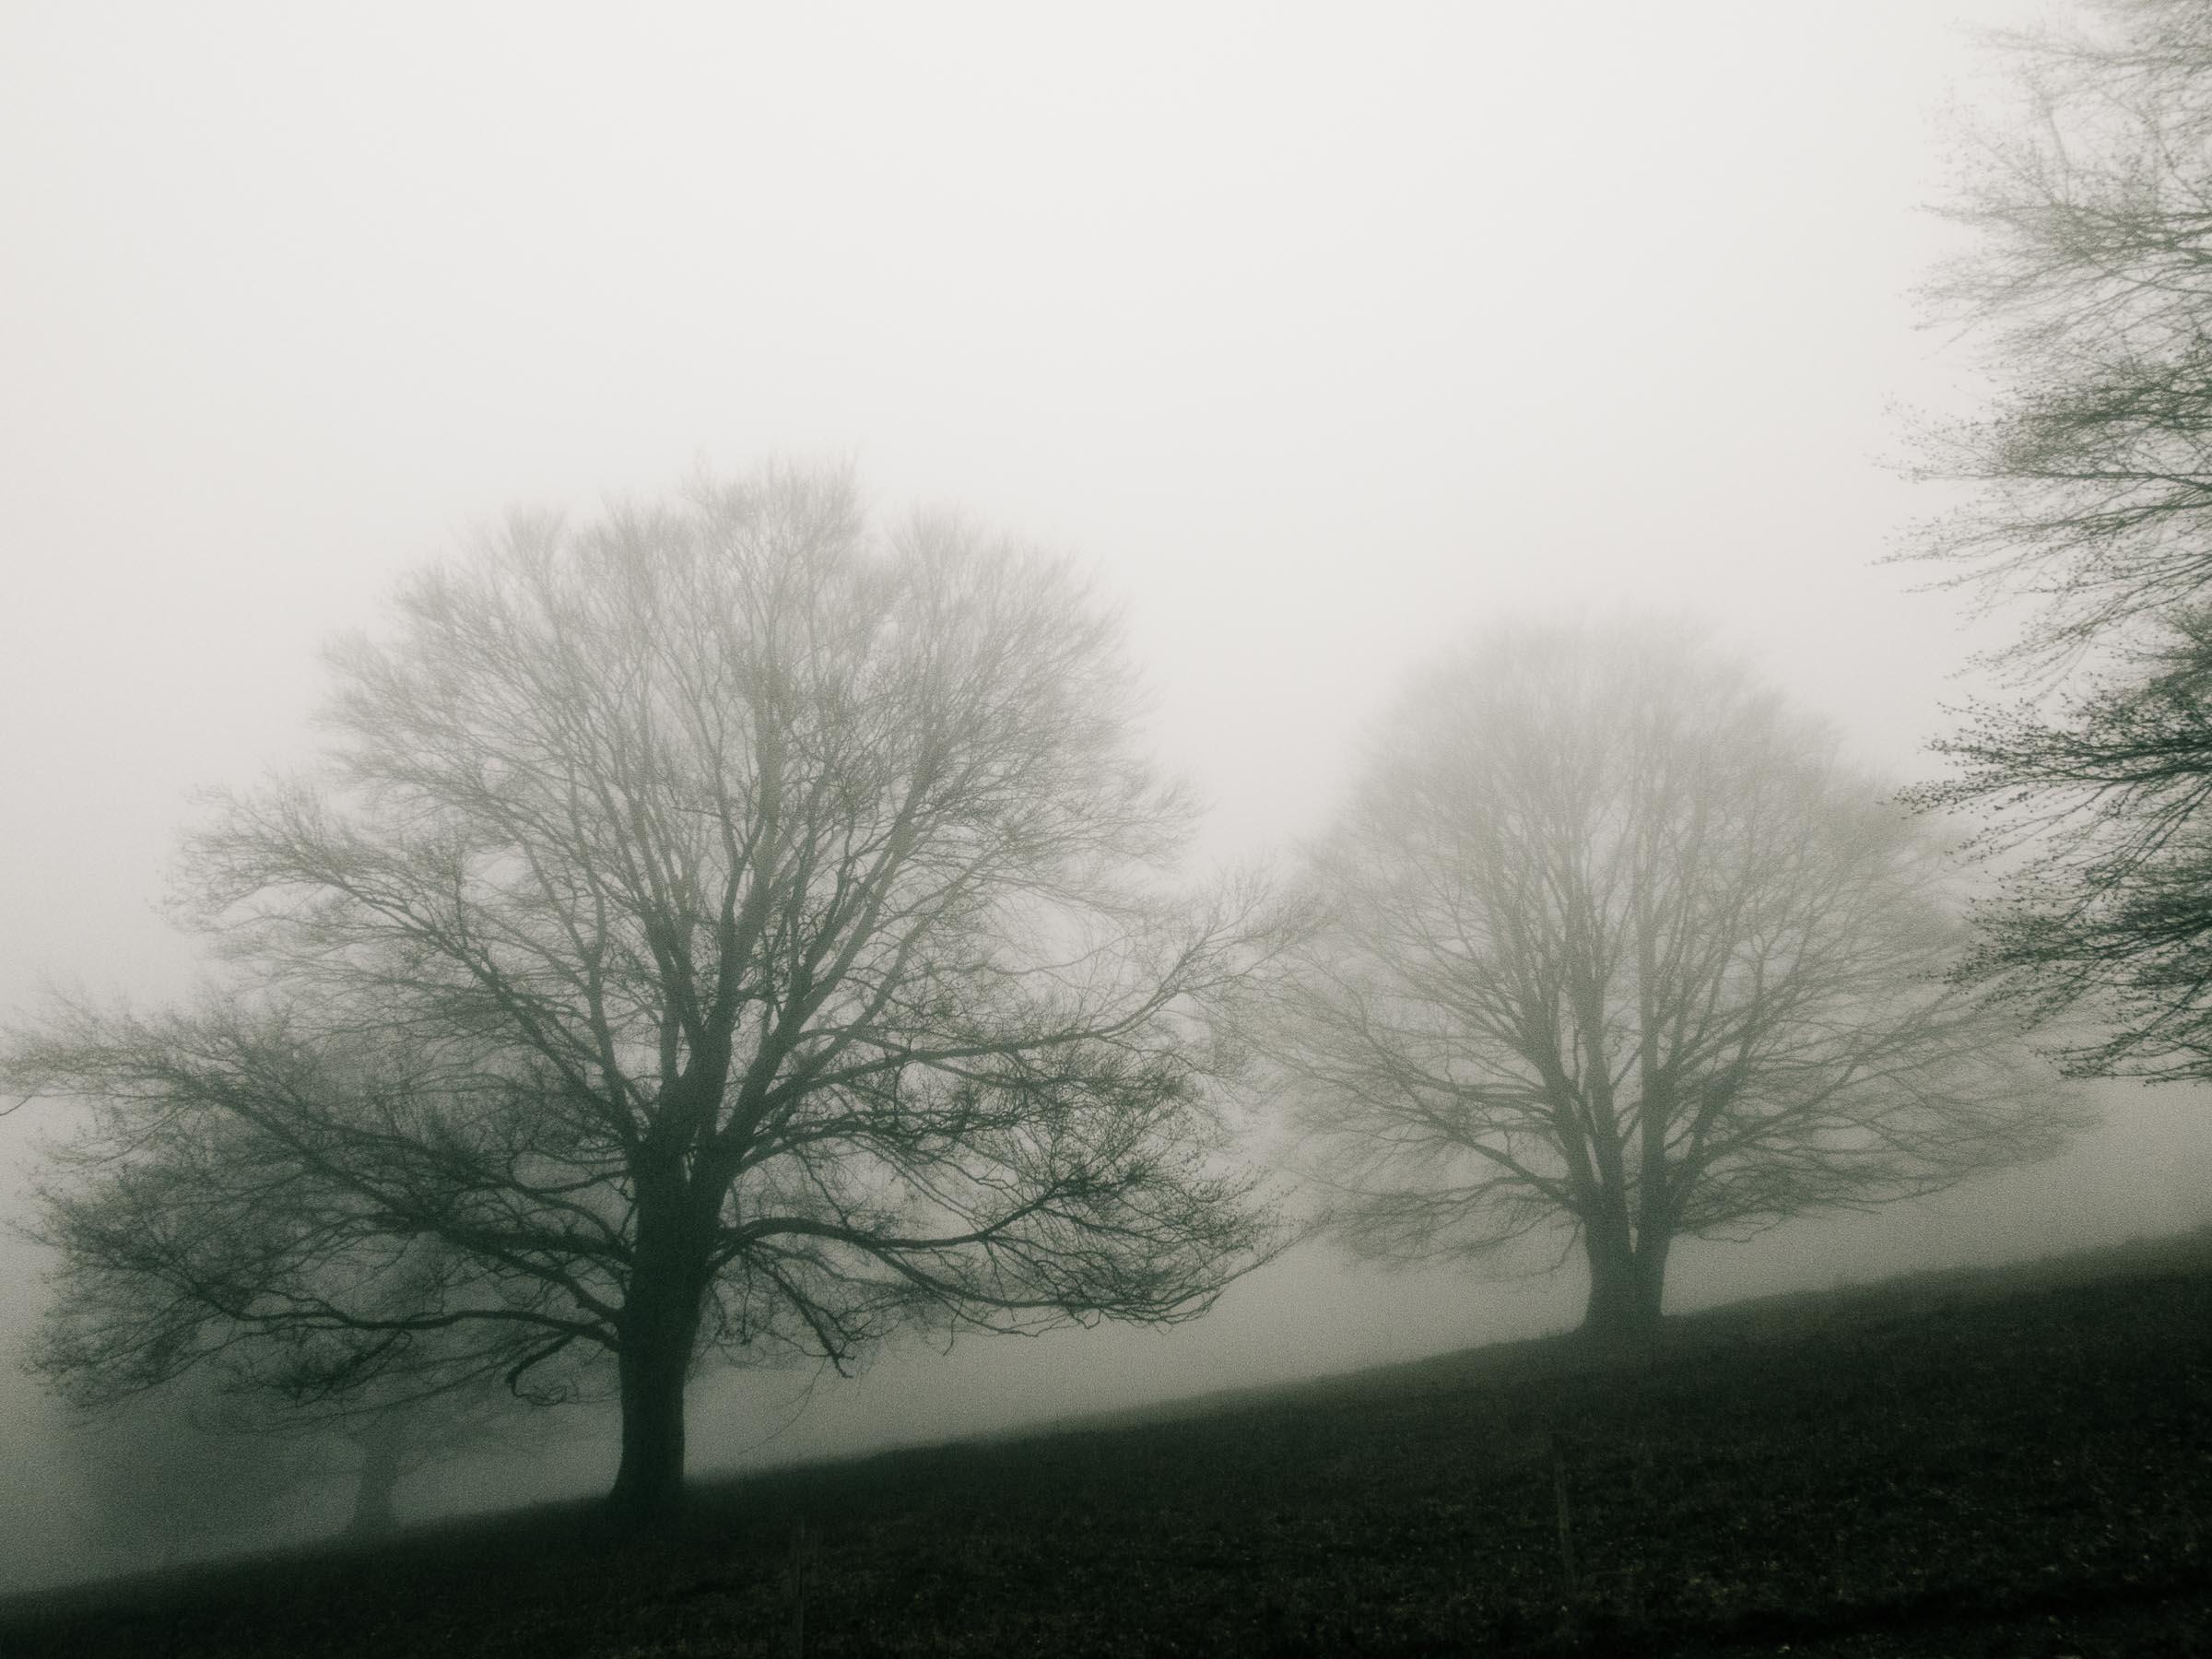 181216_Nebel_Wald_032